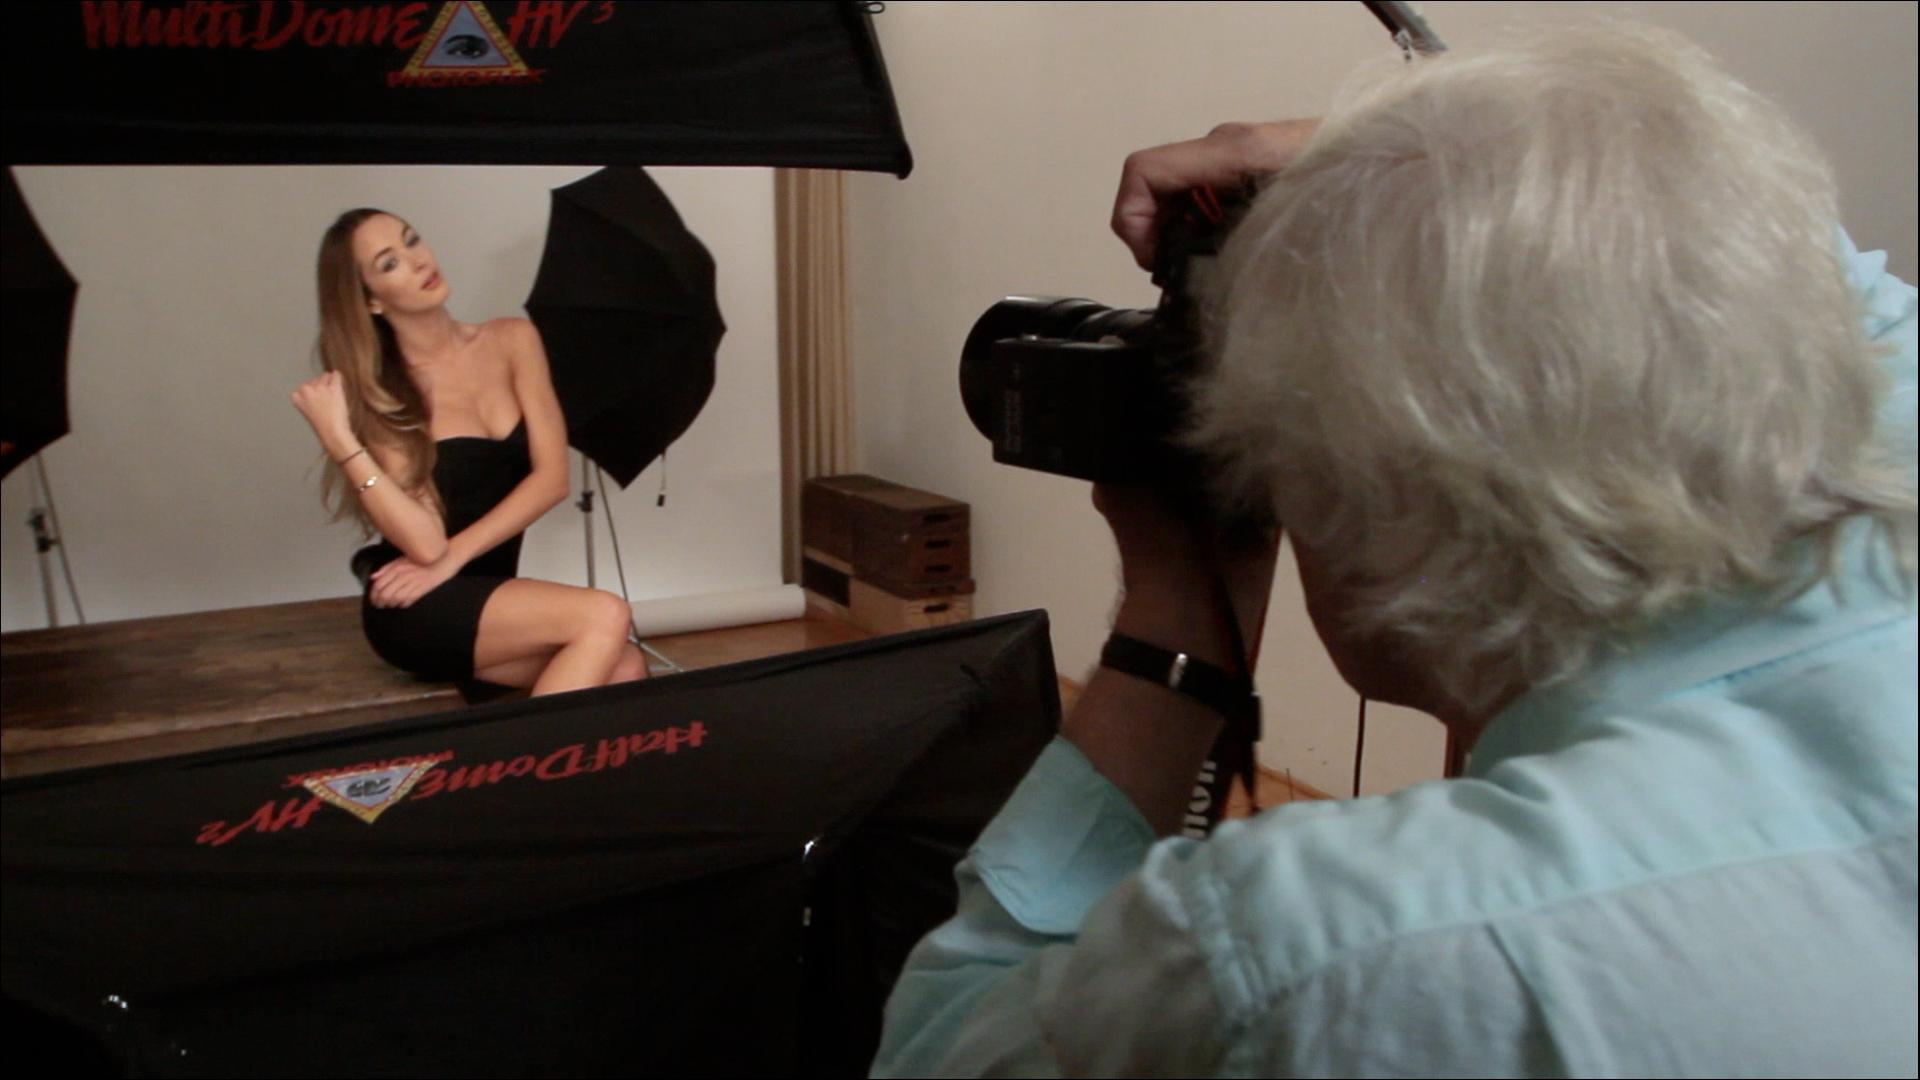 Course highlights: Douglas Kirkland on Photography: Studio Portraiture